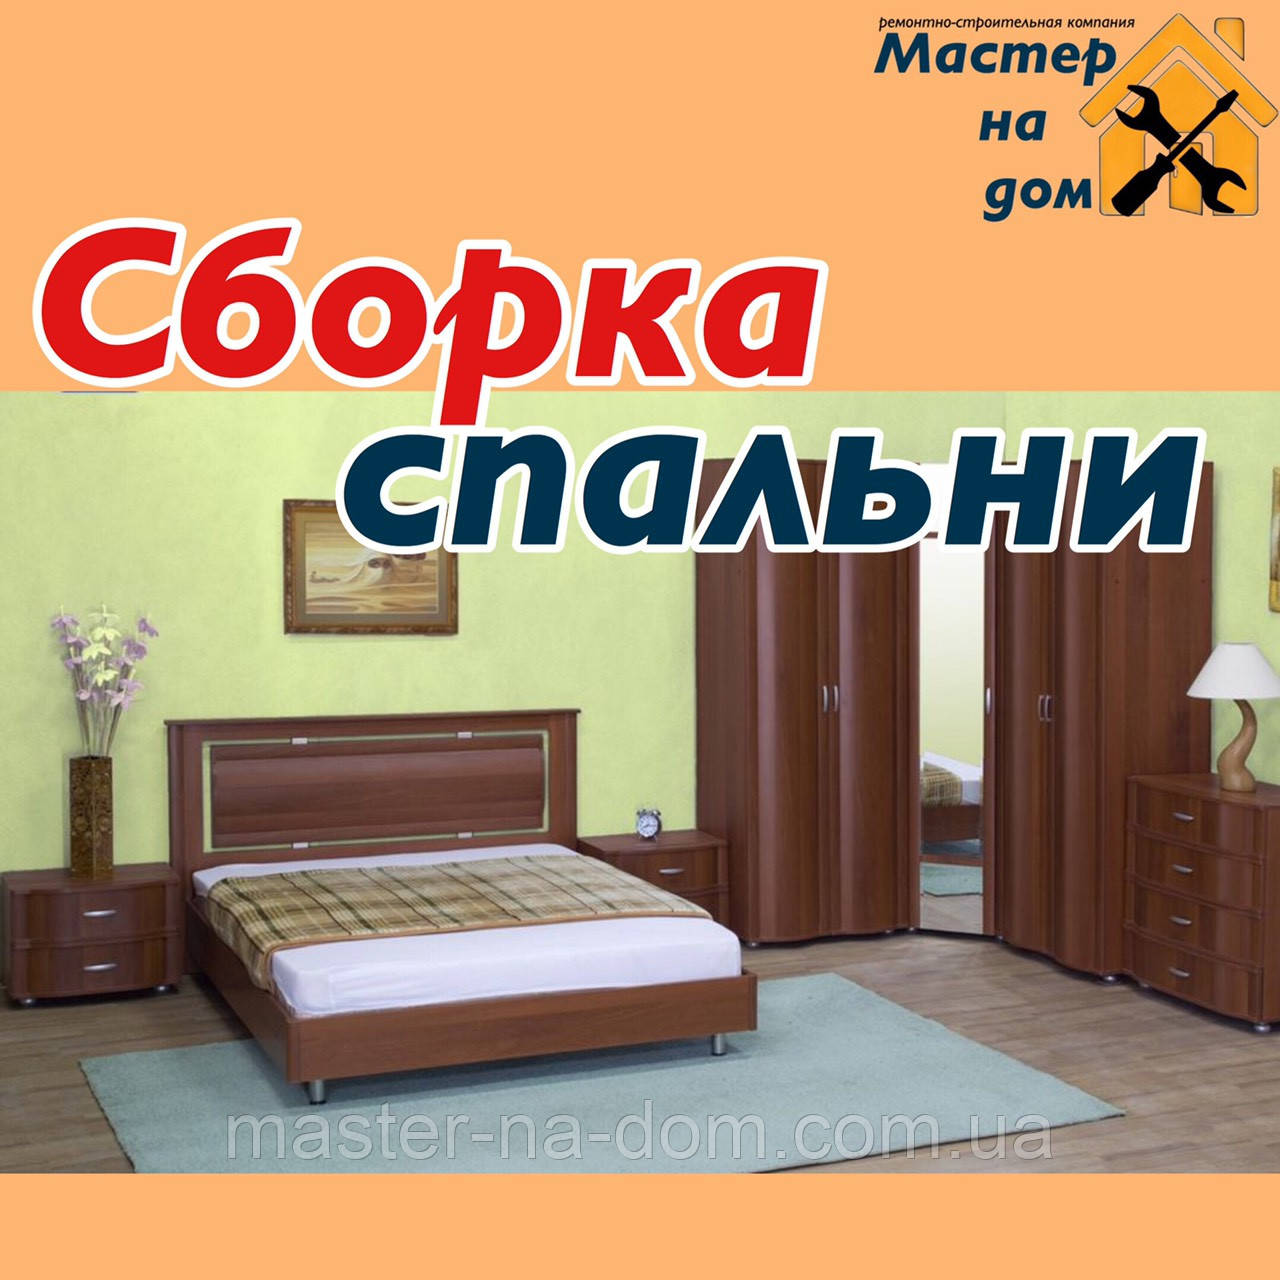 Сборка спальни: кровати, комоды, тумбочки в Ровном